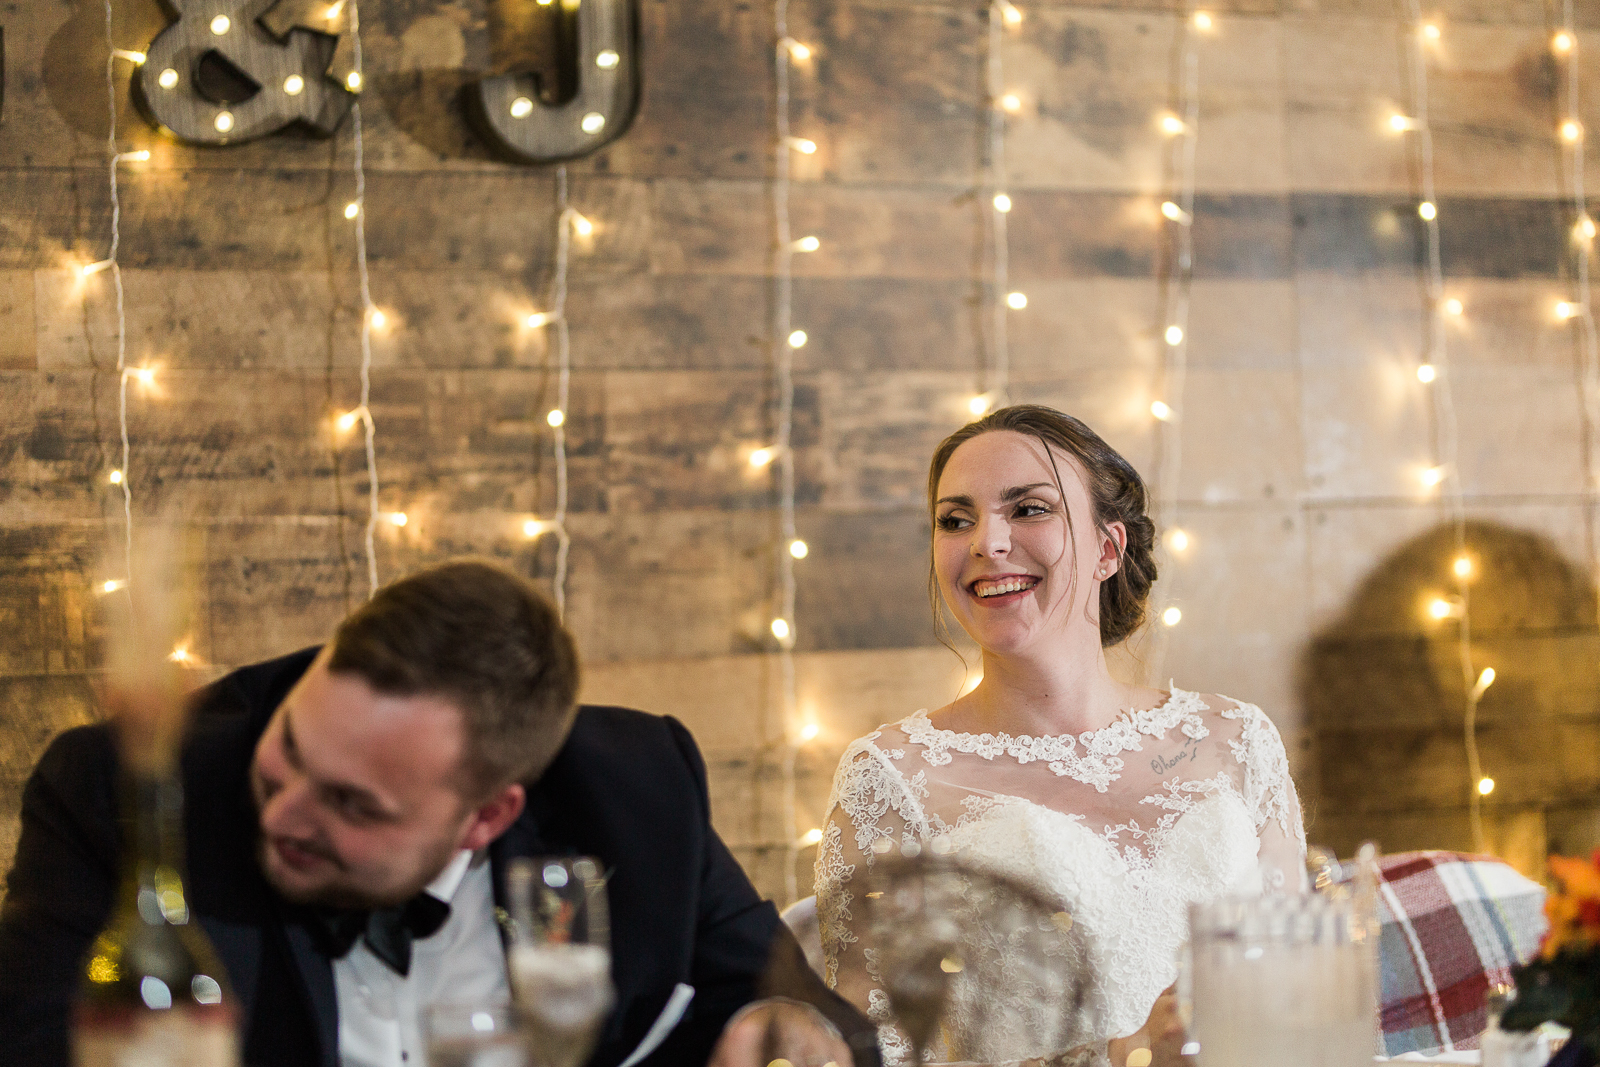 gander-wedding-photographer-136.jpg